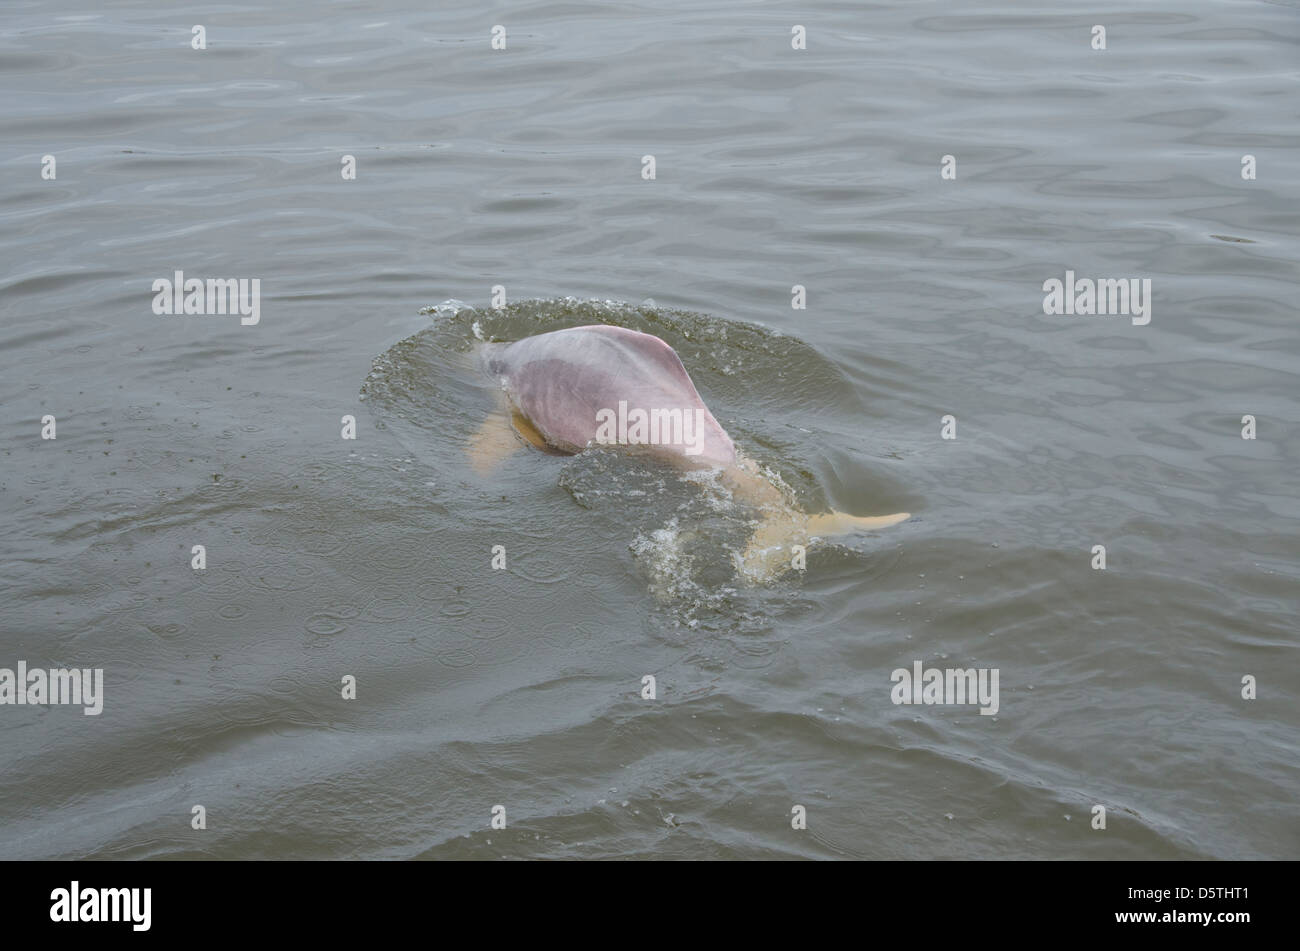 Brazil, Amazonas, Rio Tapajos, Santarem. Freshwater pink Amazon dolphin (WILD: Inia geoffrensis), endangered species. - Stock Image